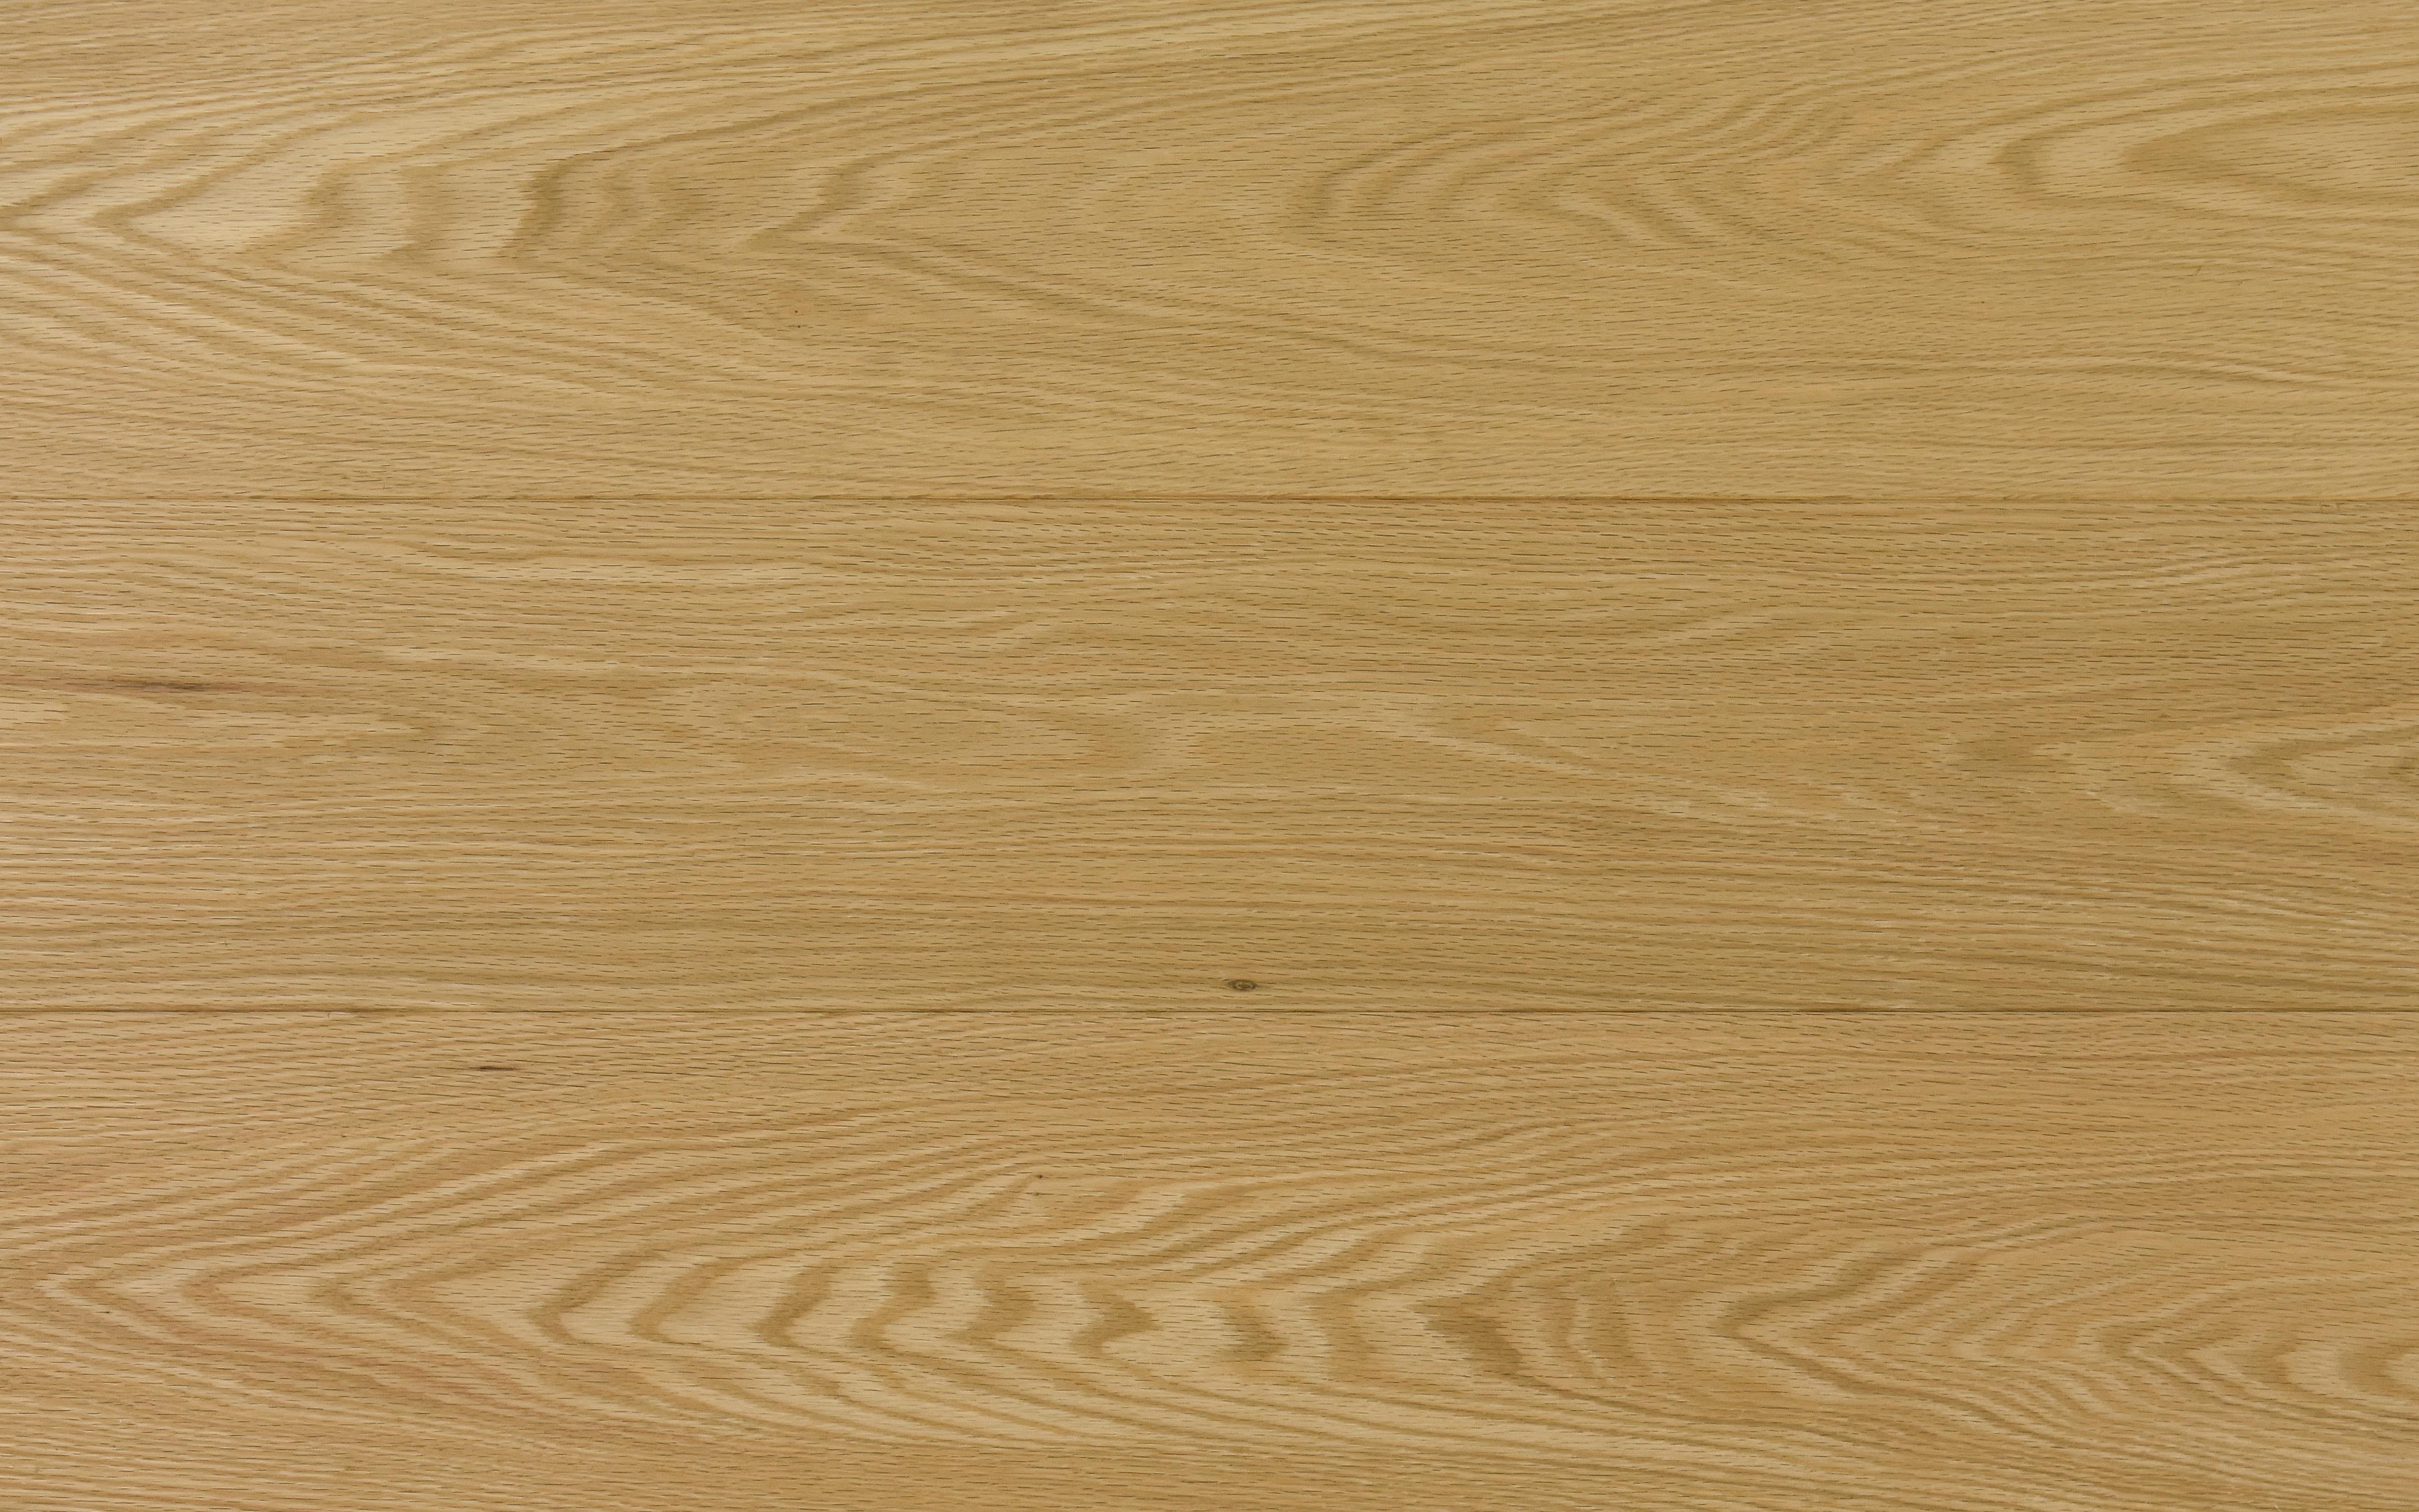 Eiken Houten Vloeren : Houten vloeren friesland eppinga